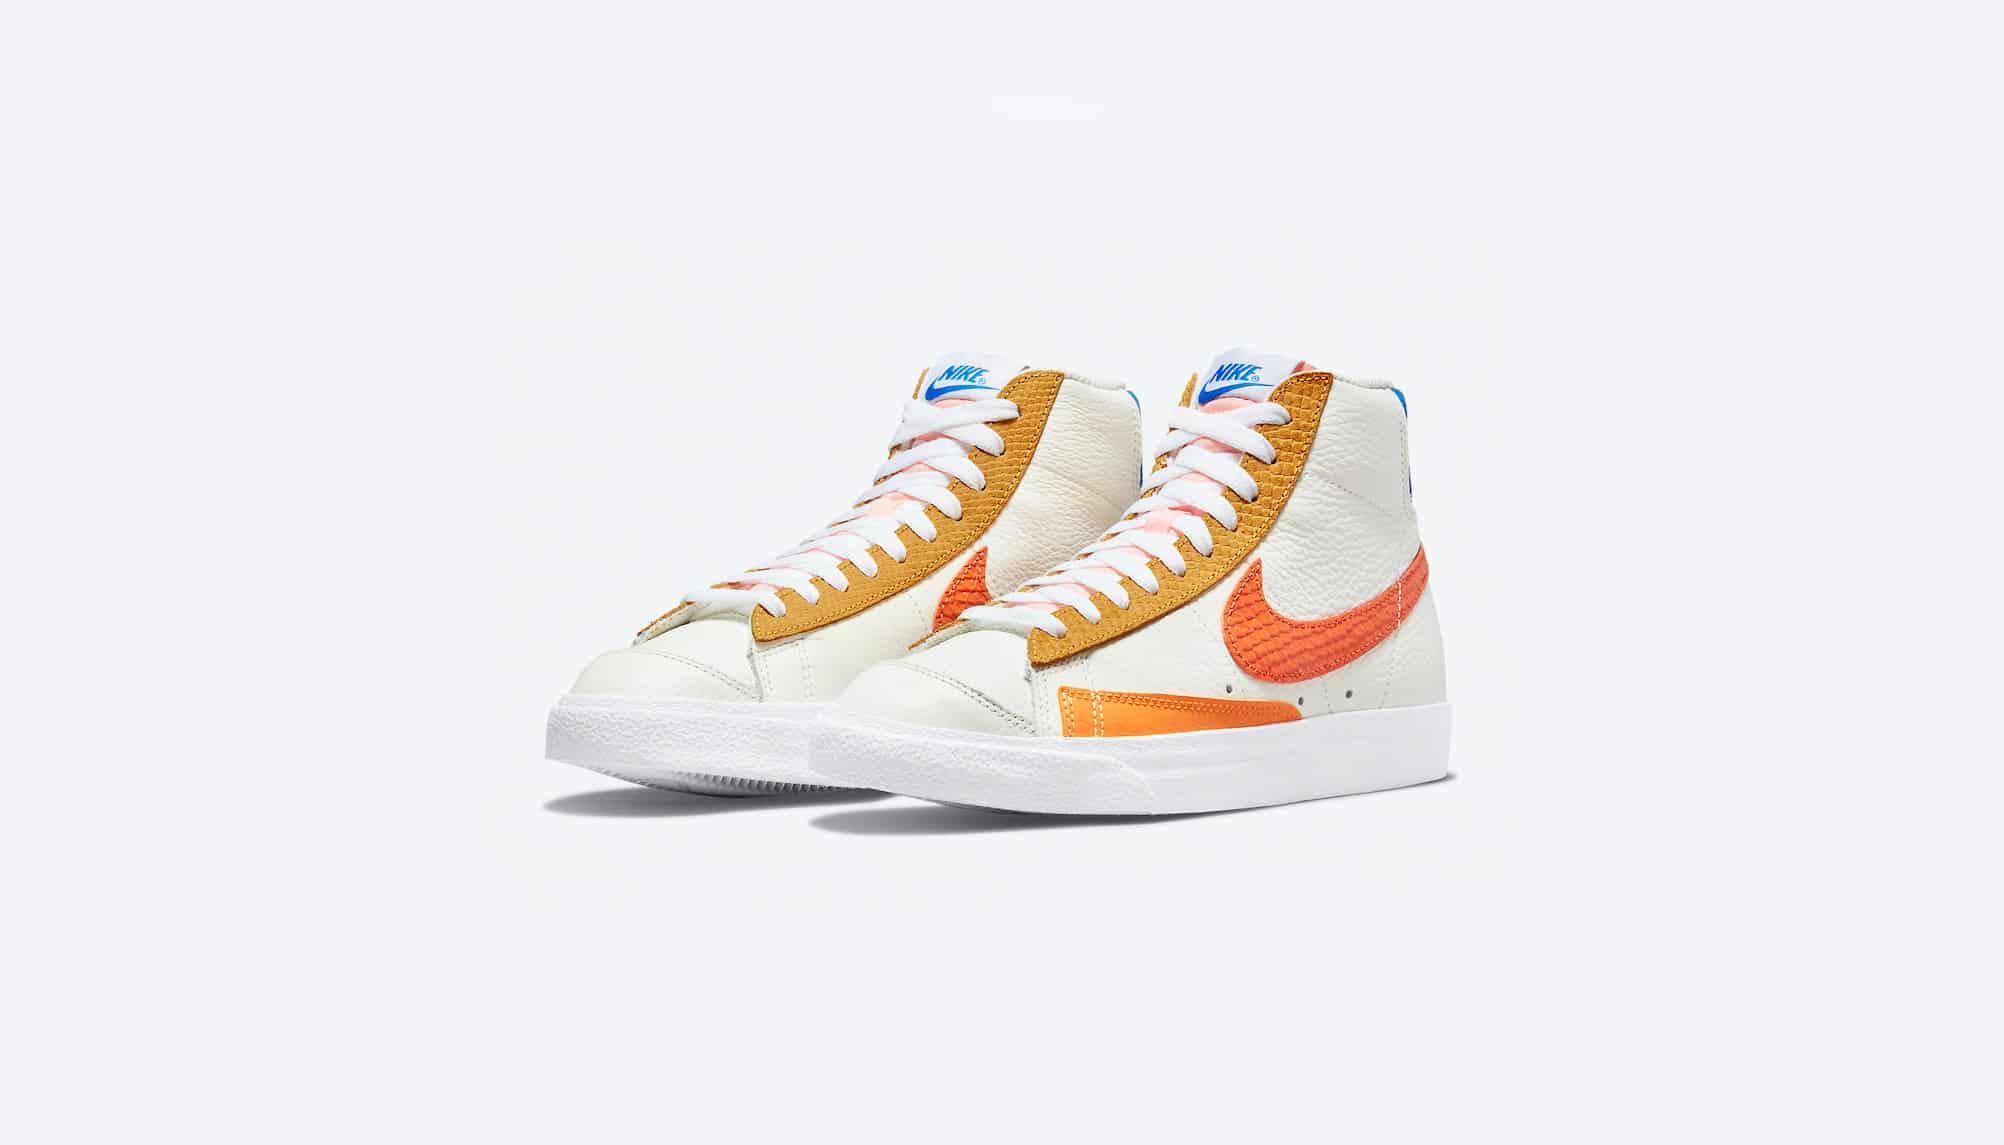 Preview: Nike Blazer Mid '77